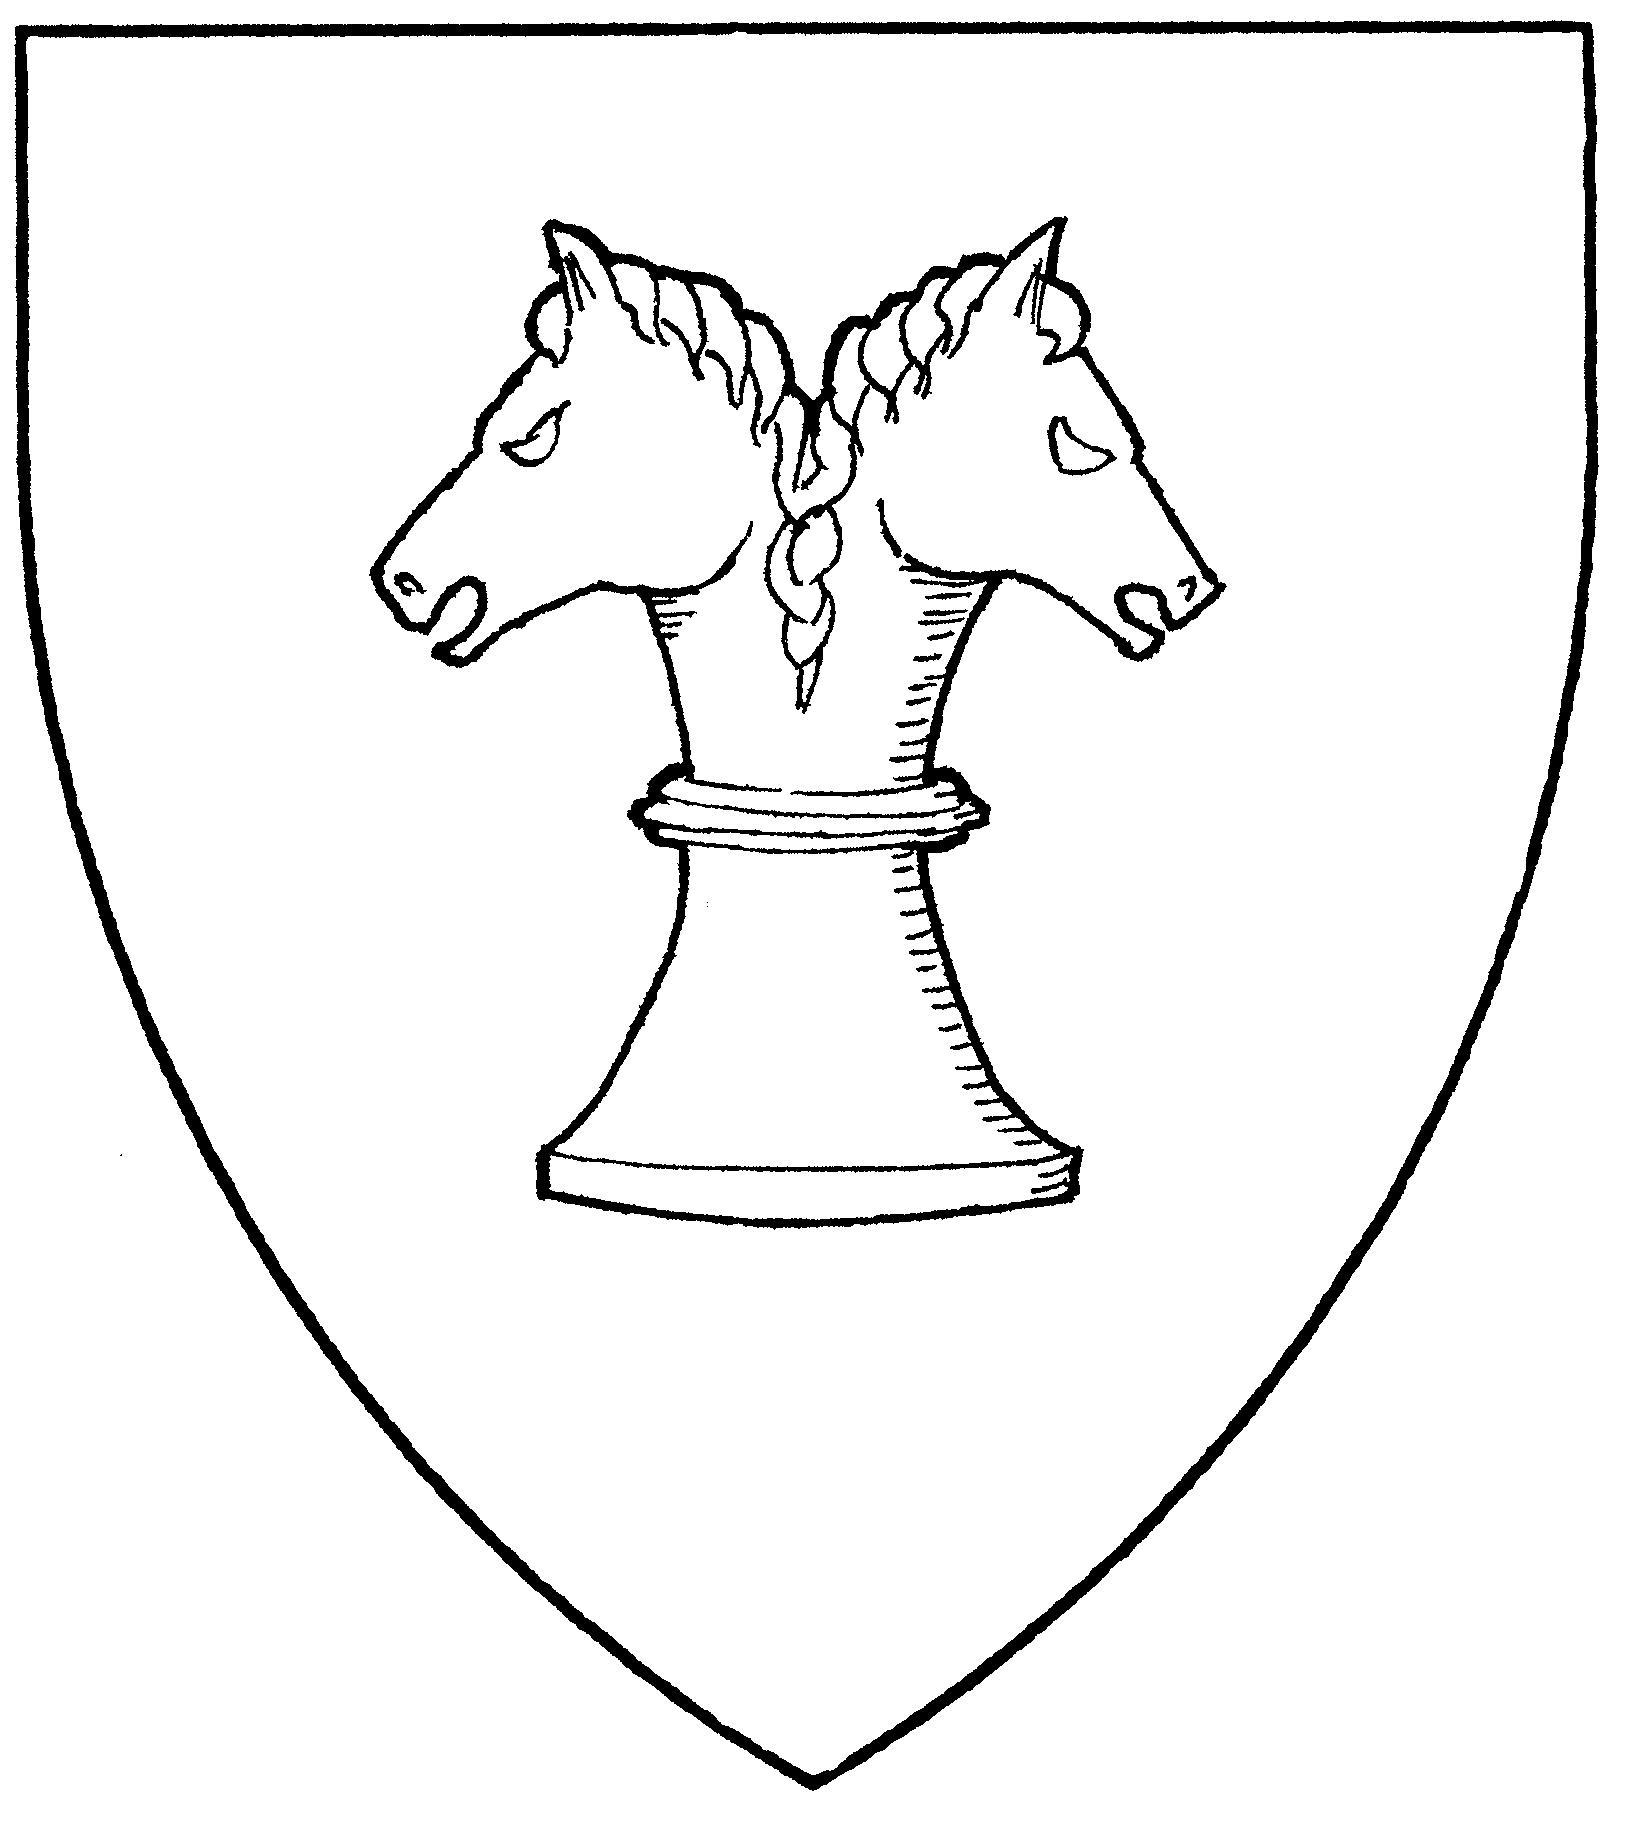 1635x1821 Chess Pieces Mistholme